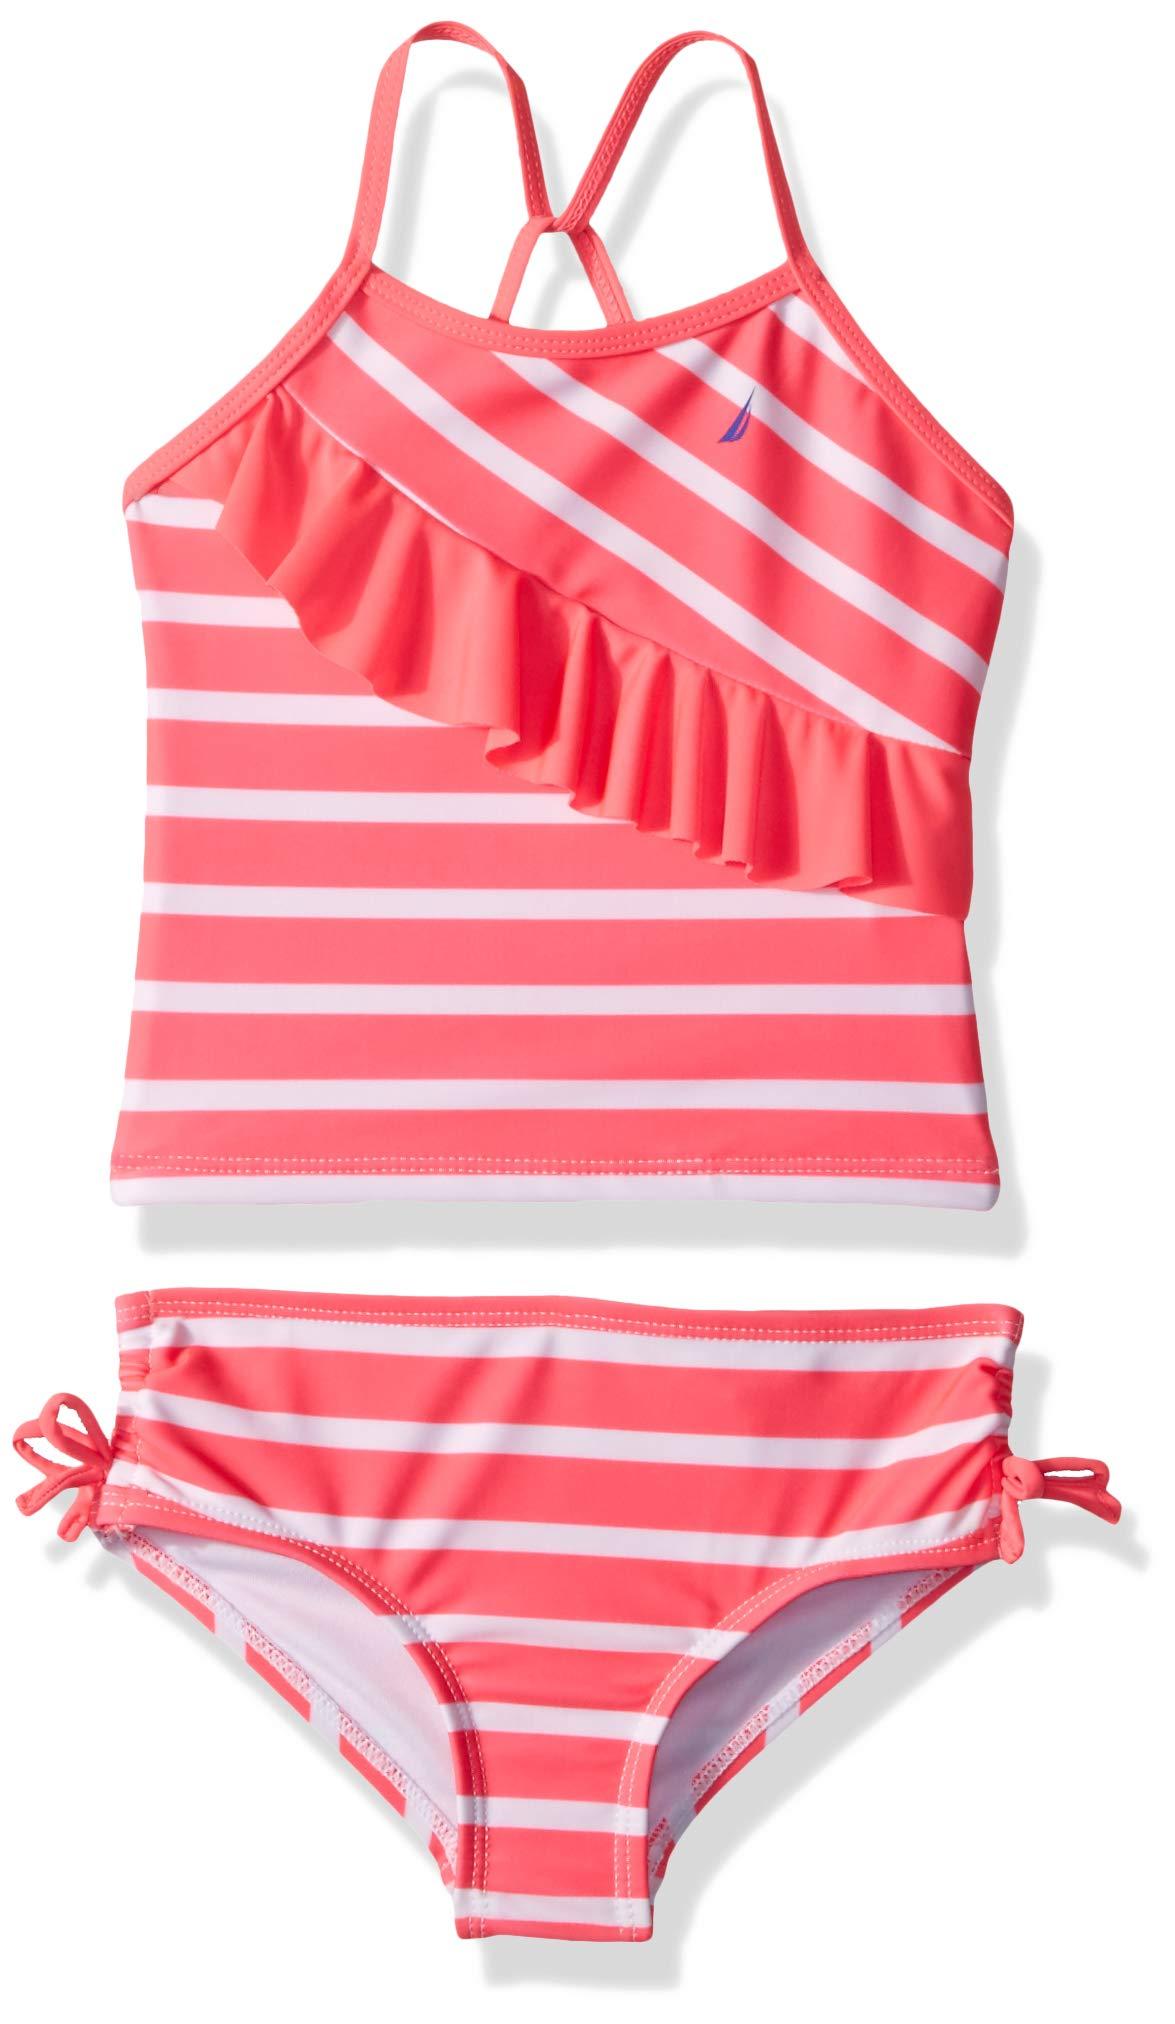 Nautica Little Girls' Tankini Swim Suit, Stripe neon Pink, 6 by Nautica (Image #1)